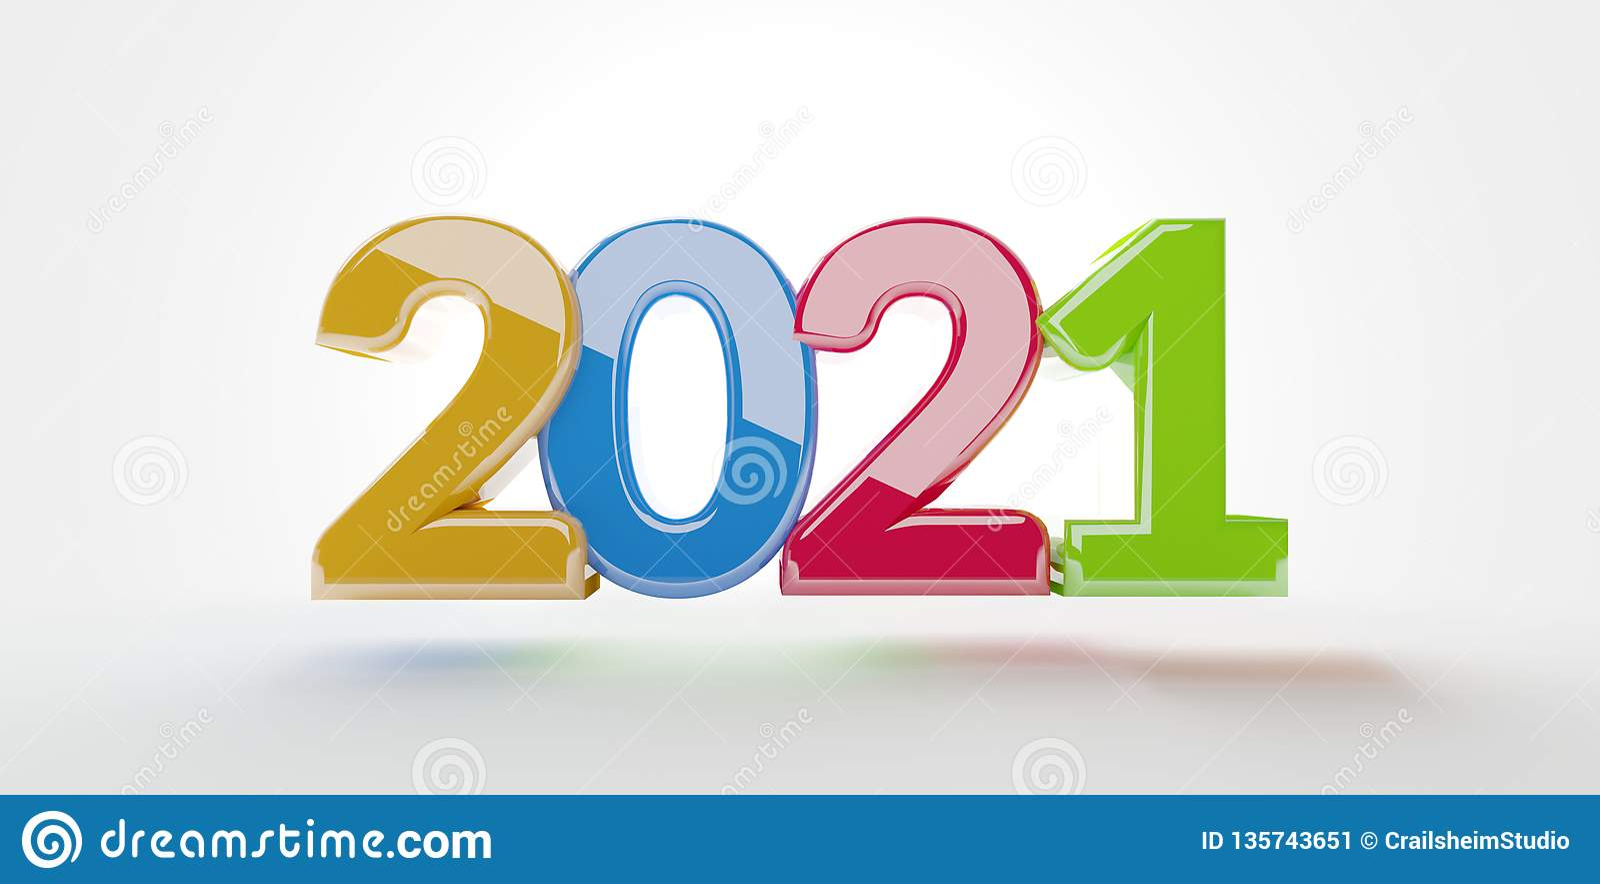 2022 3d illustration Graphic Image Stock Illustration